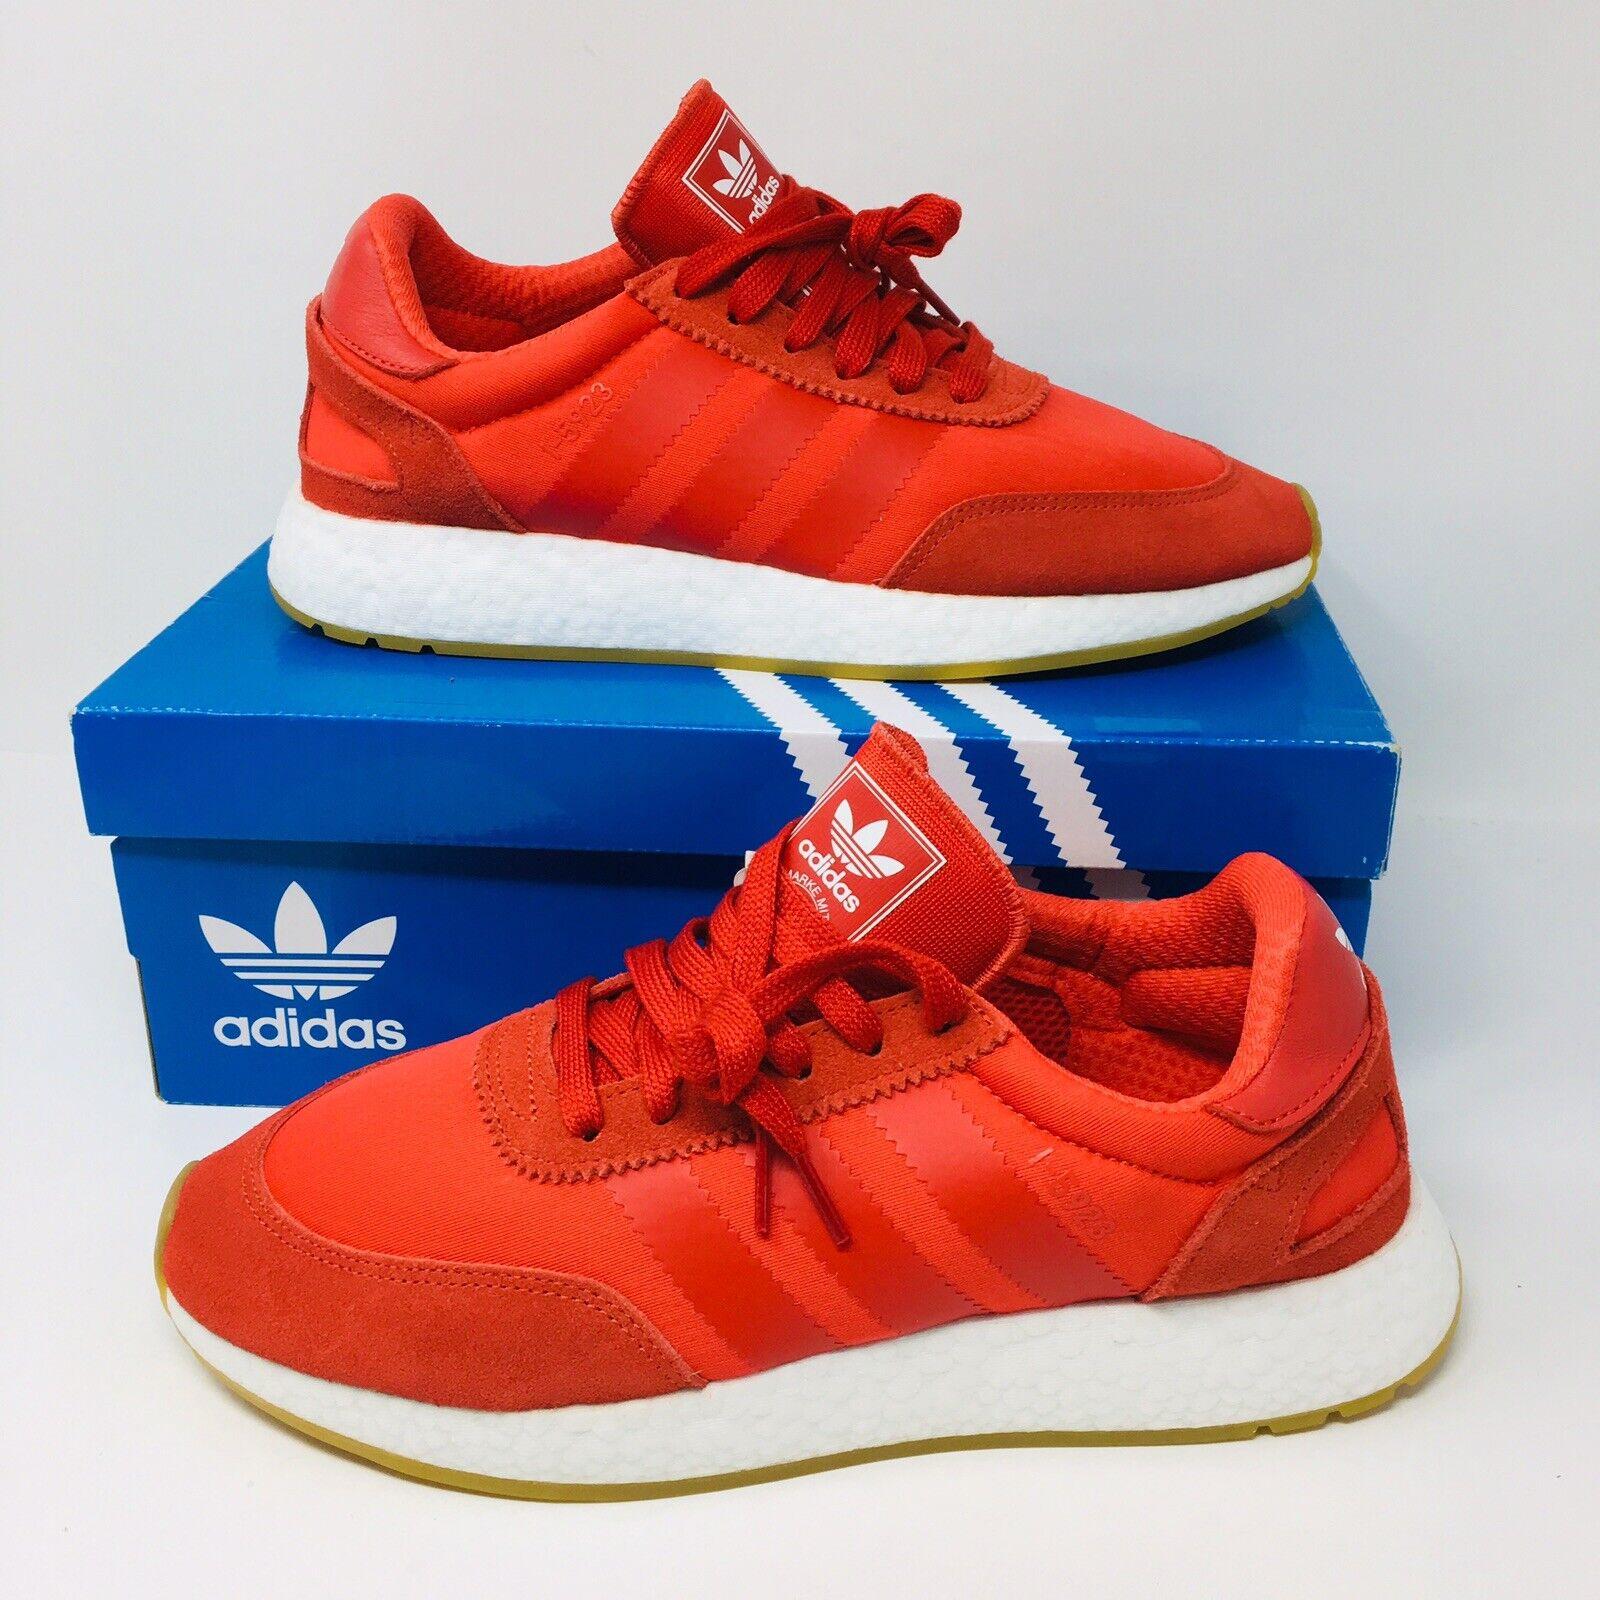 b2cd61e208c NEW Adidas Adidas Adidas Iniki 2 Boost (Men Size 11) Red Running shoes NMD